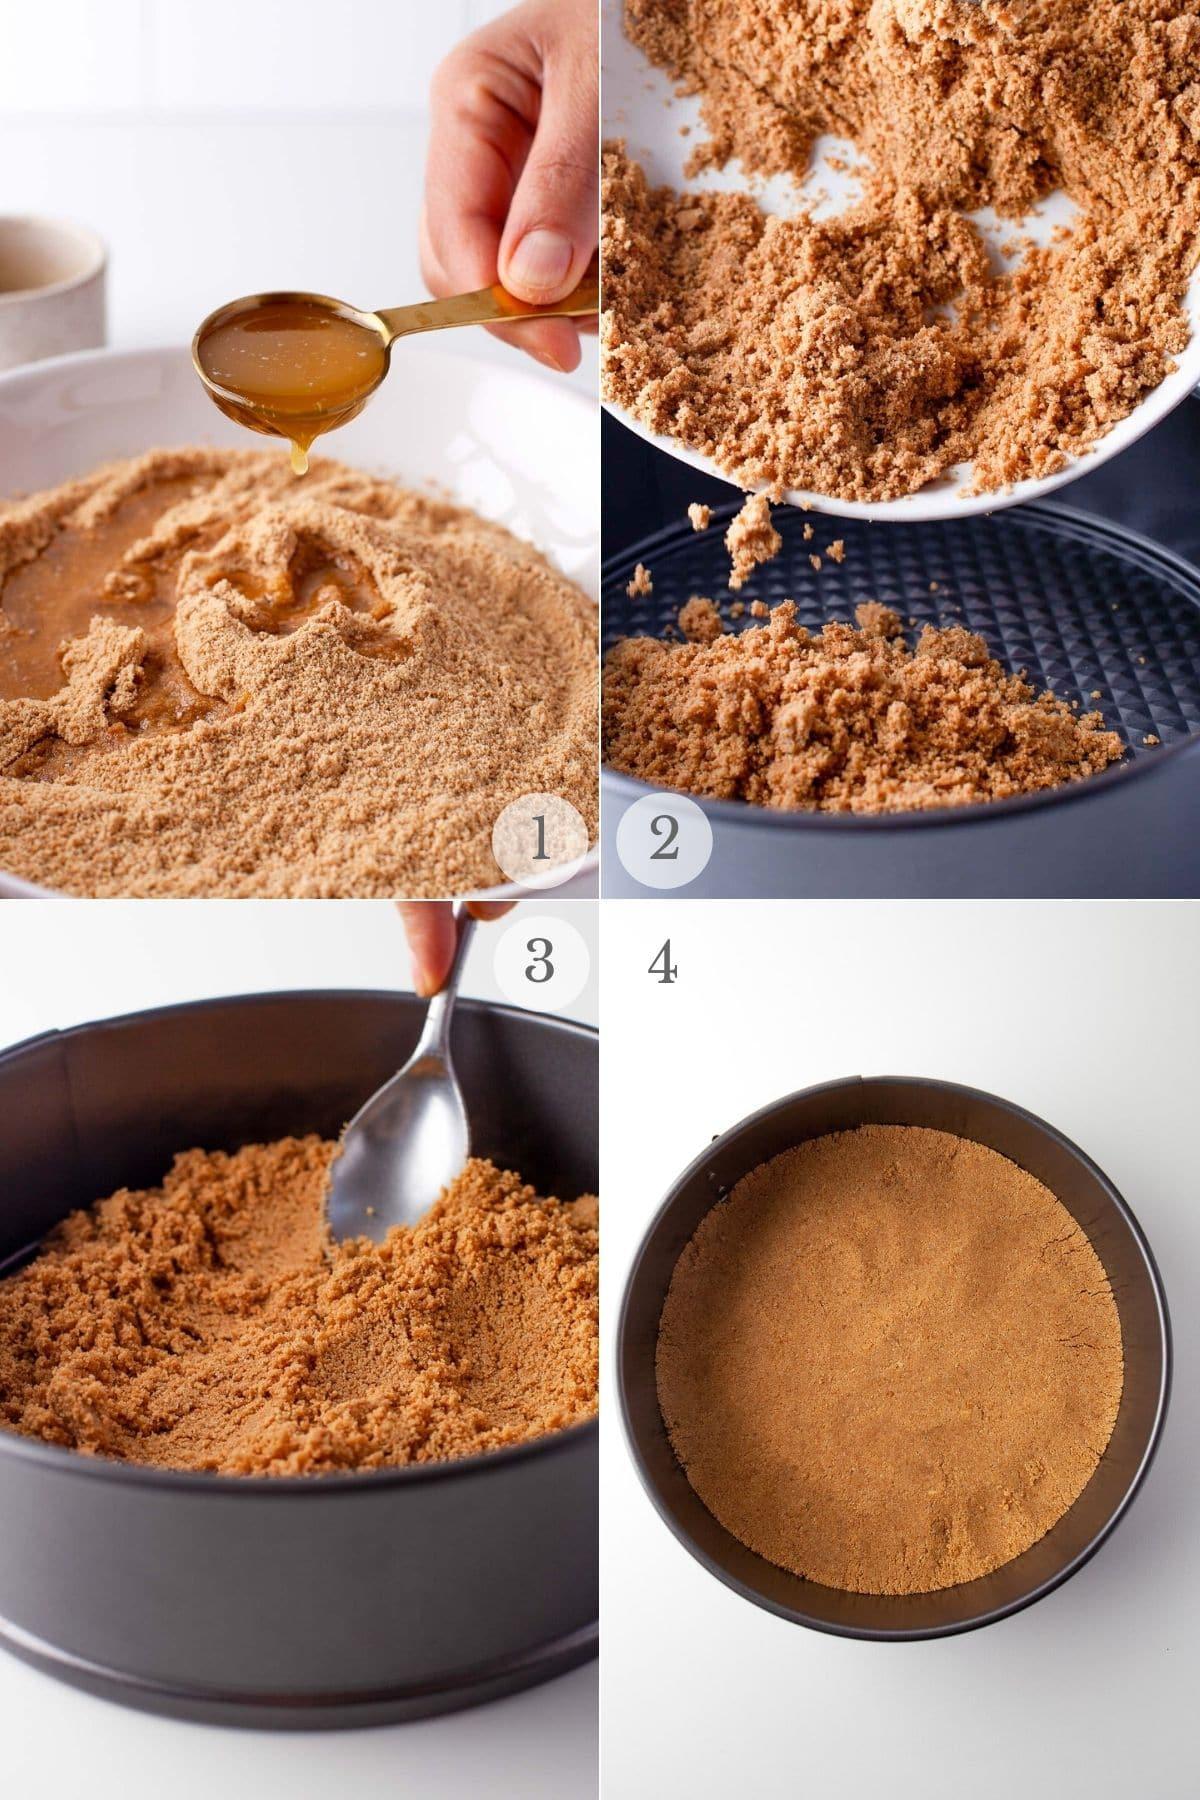 frozen key lime pie recipe steps 1-4 making the crust